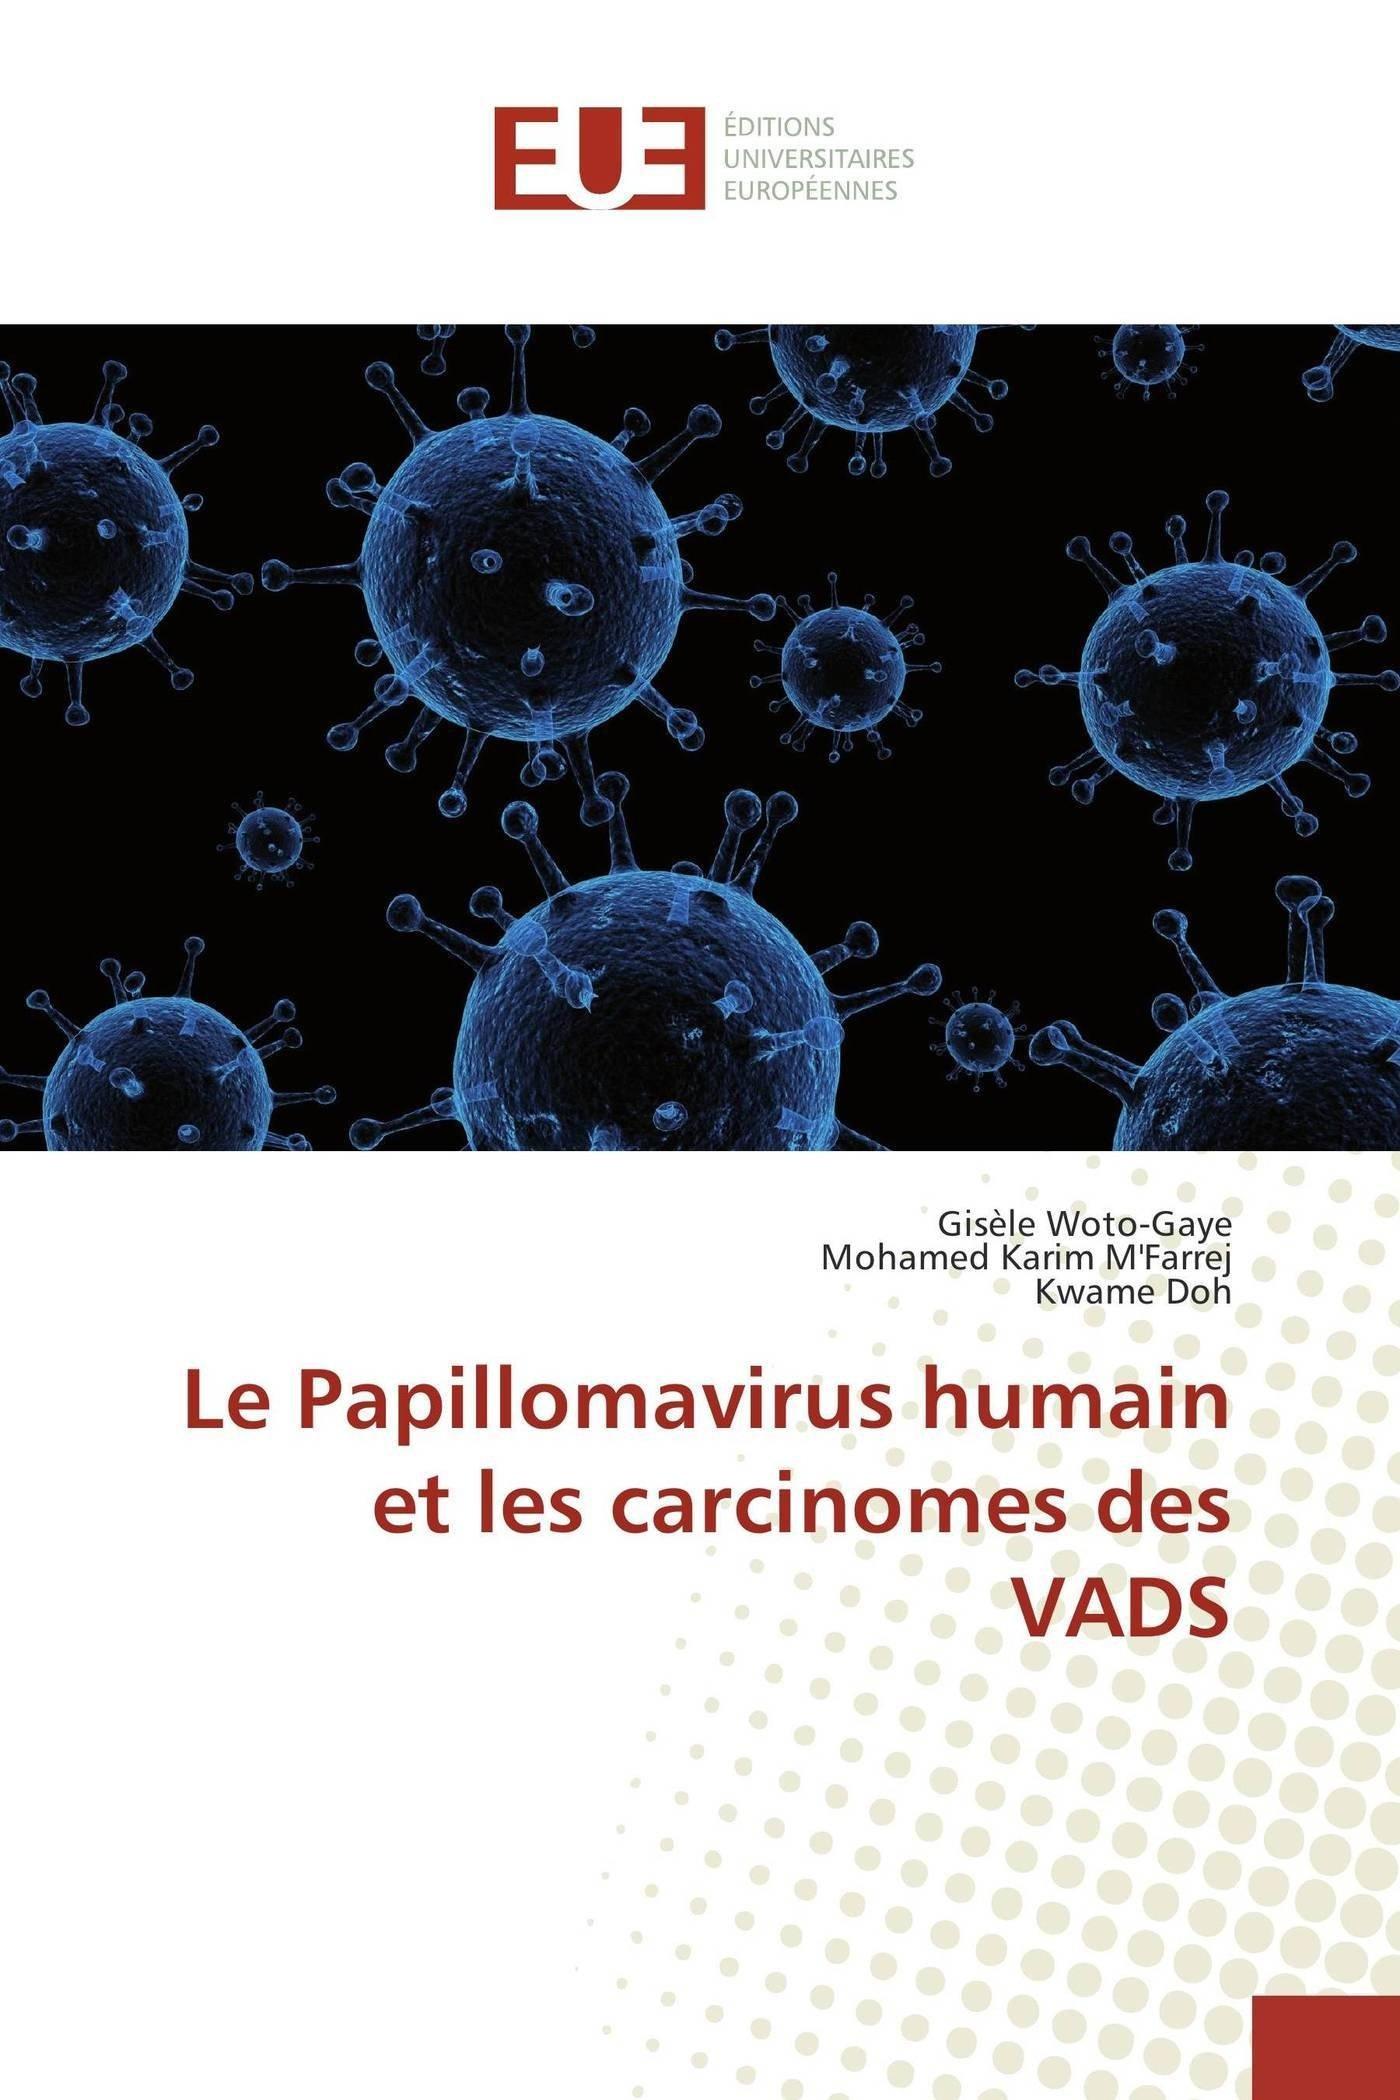 Papillomavirus humain( hpv), Mode de contamination du papillomavirus cheloo la